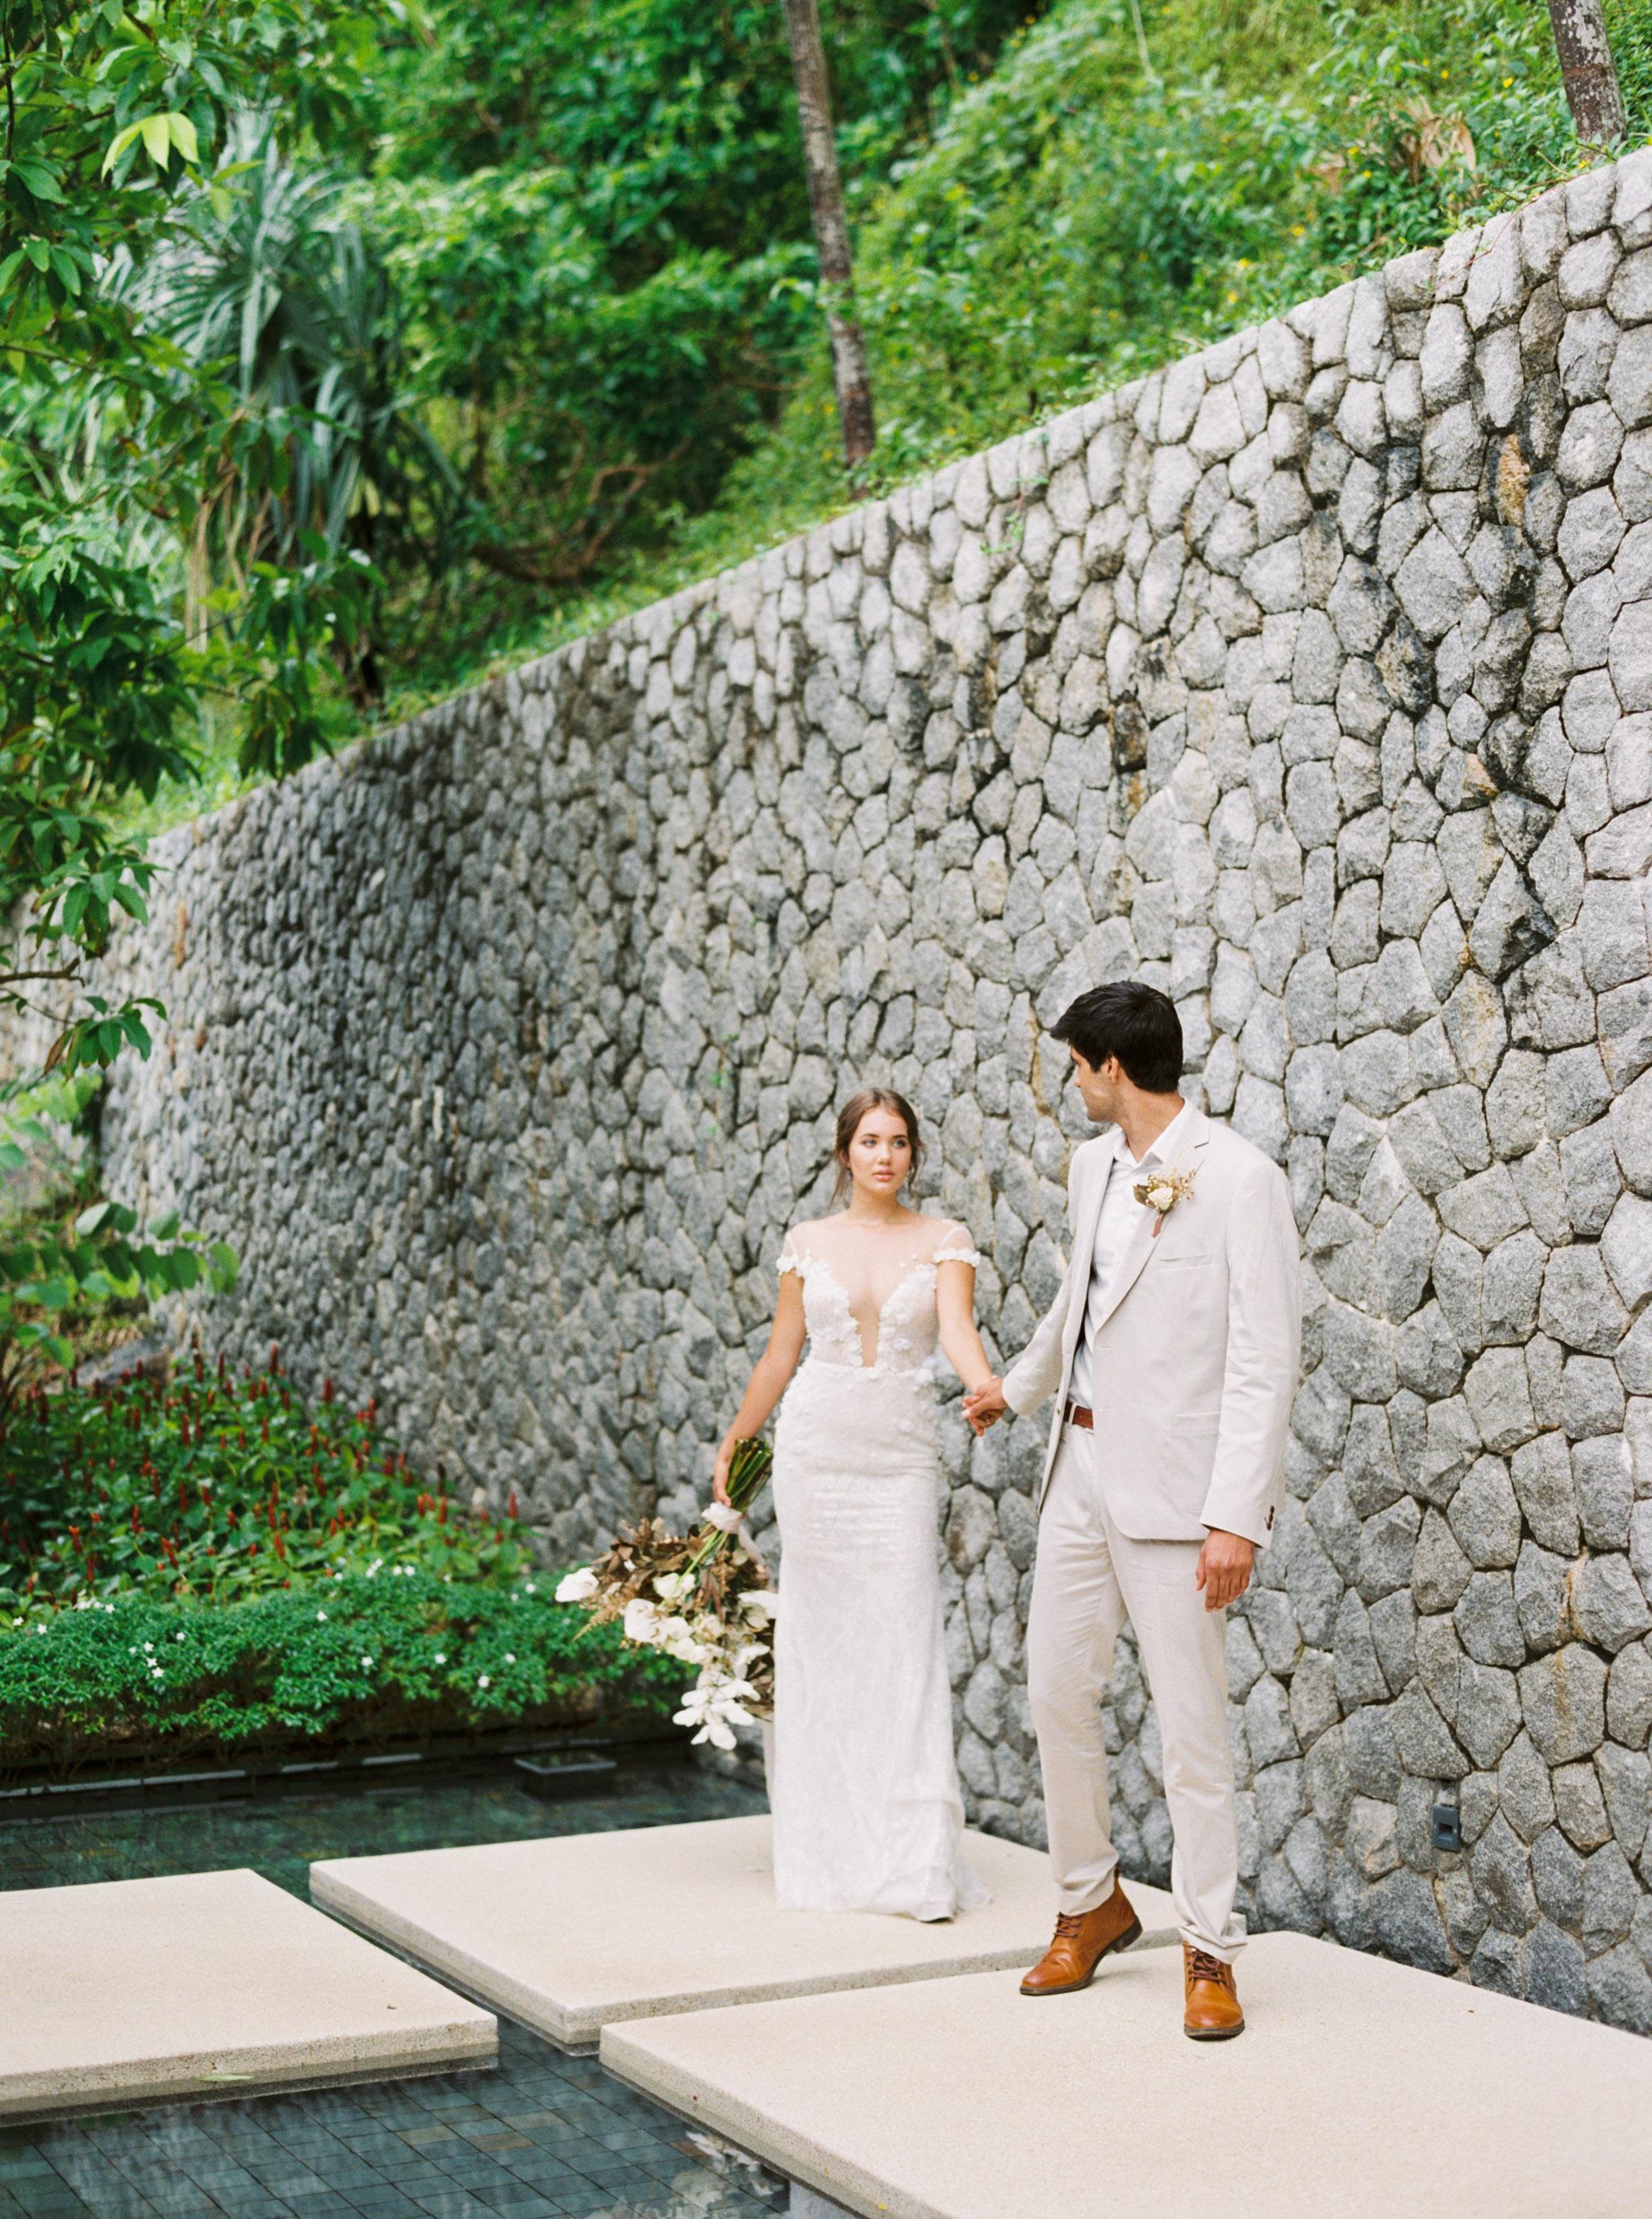 Destination Wedding Phuket Thailand Fine Art Film Photographer Sheri McMahon-00026-26.jpg